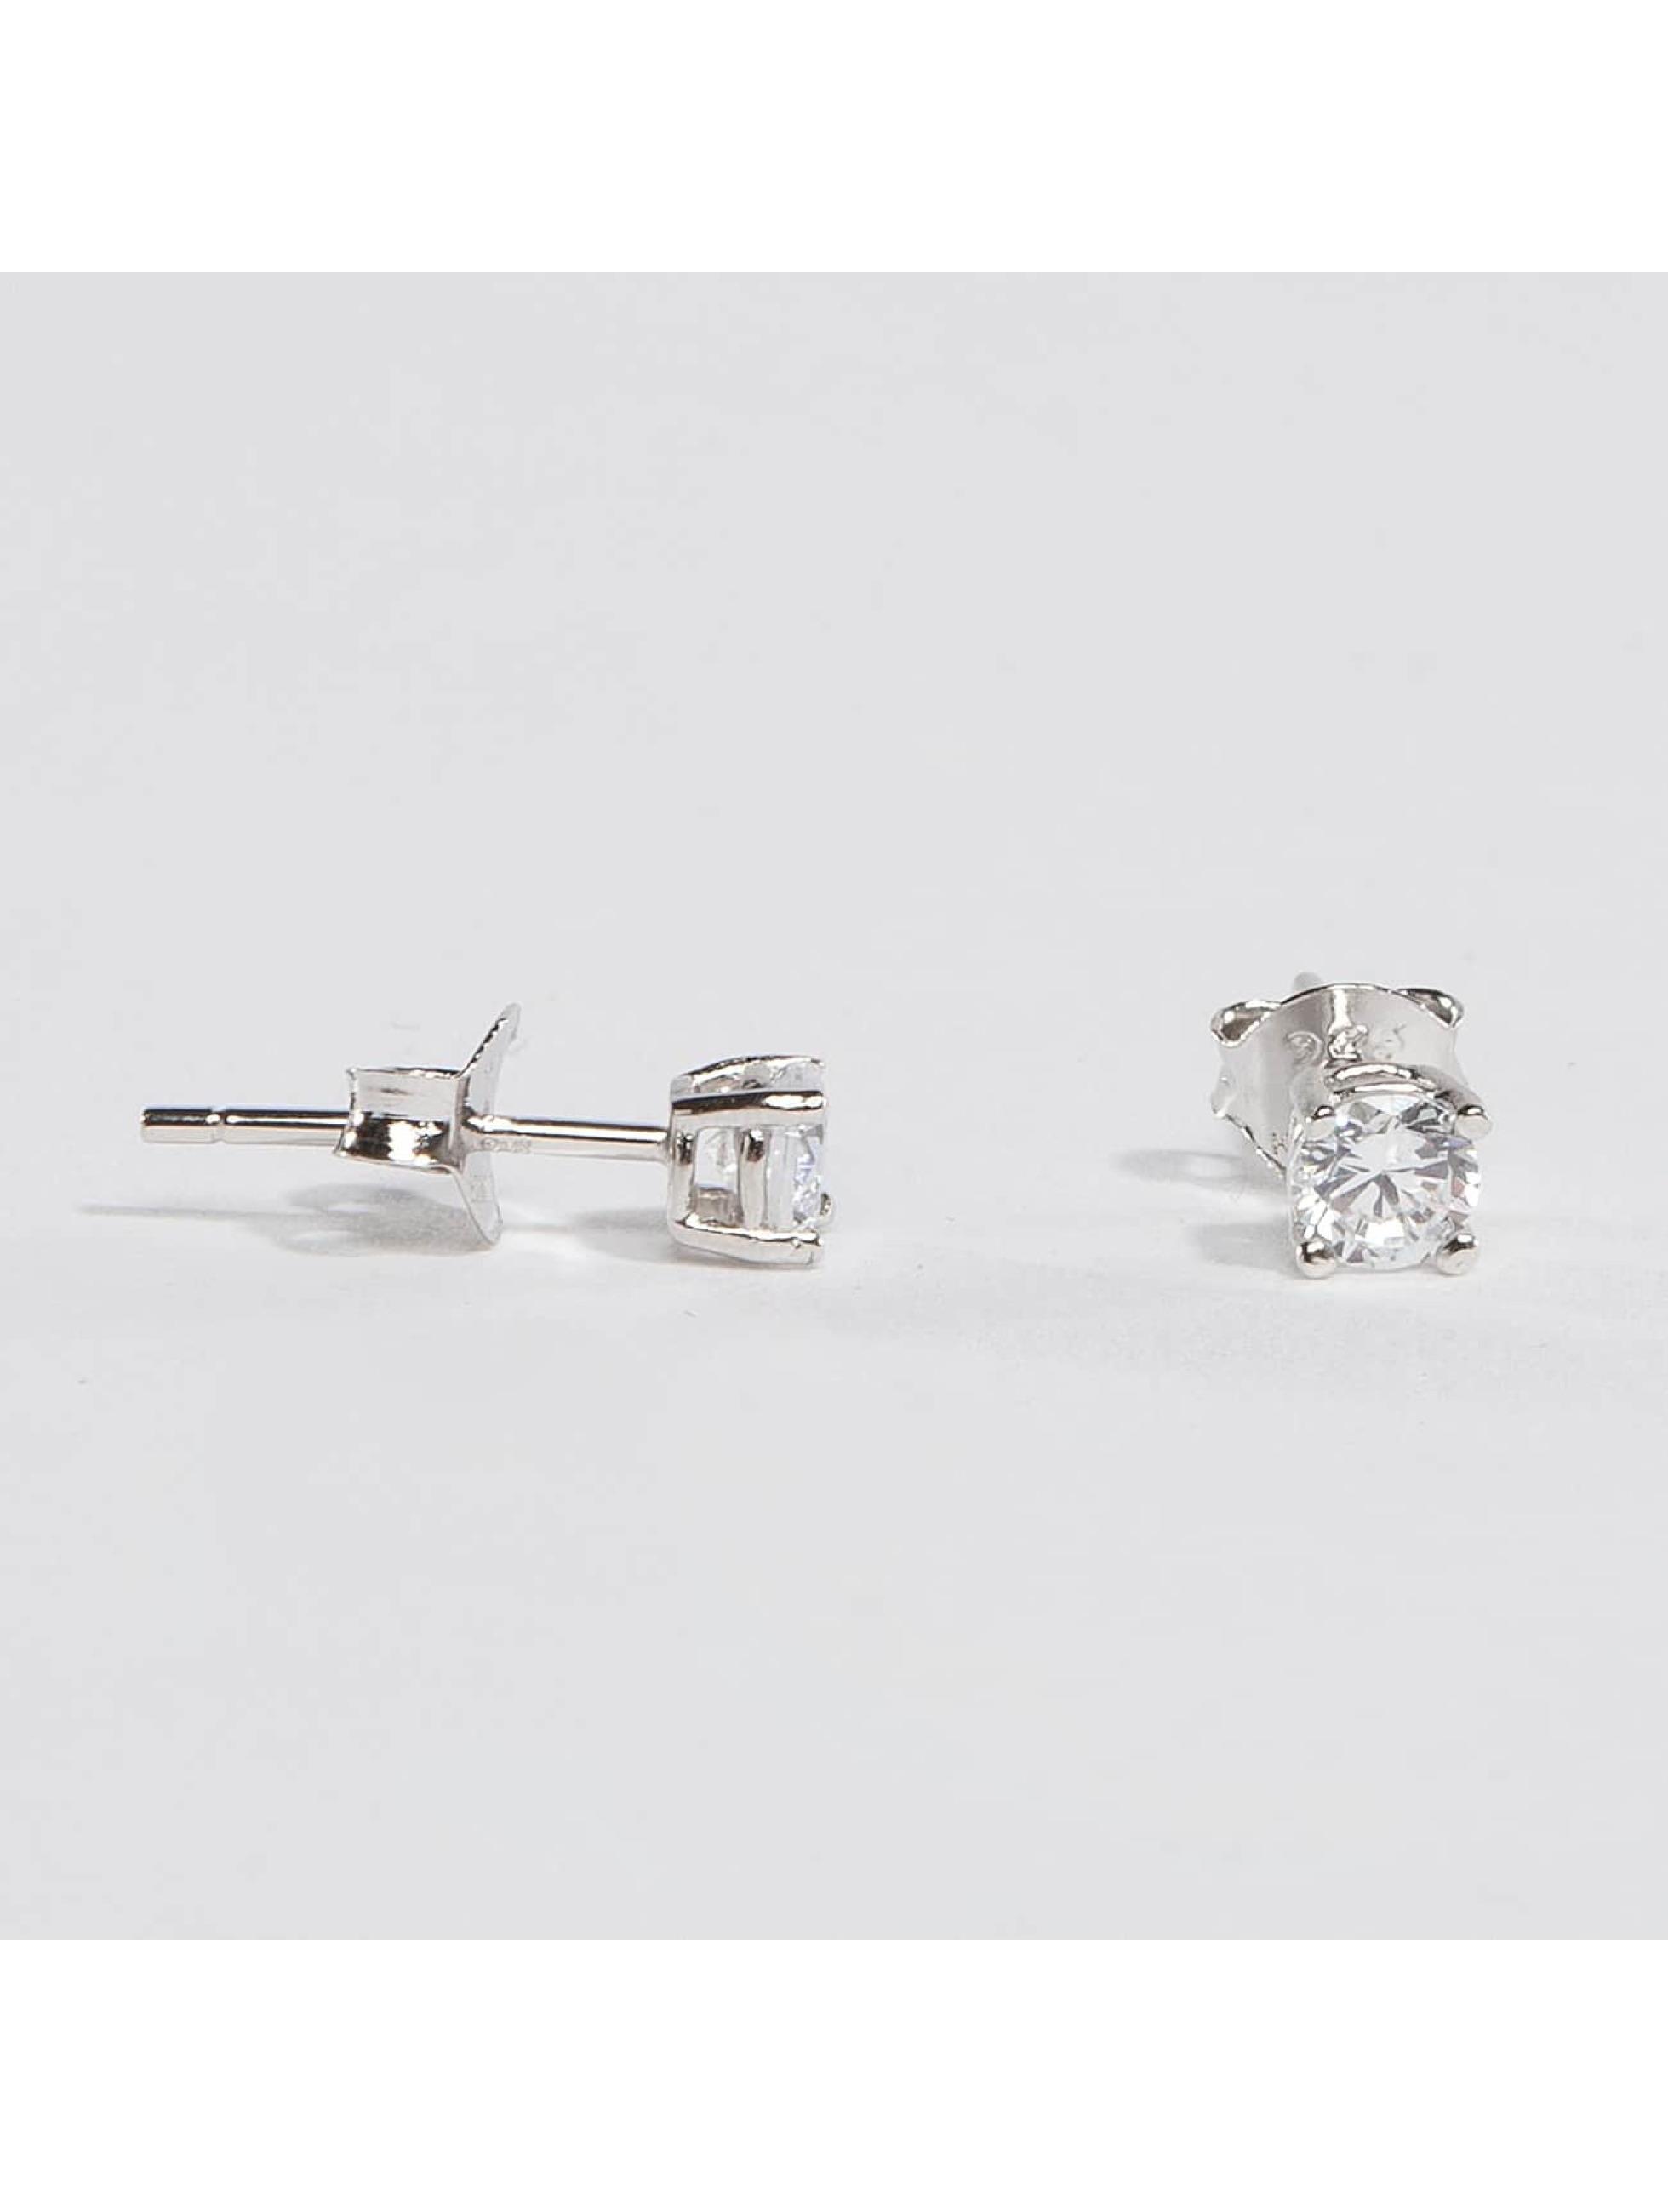 KING ICE Kolczyki Rhodium_Plated 4mm 925 Sterling_Silver CZ srebrny